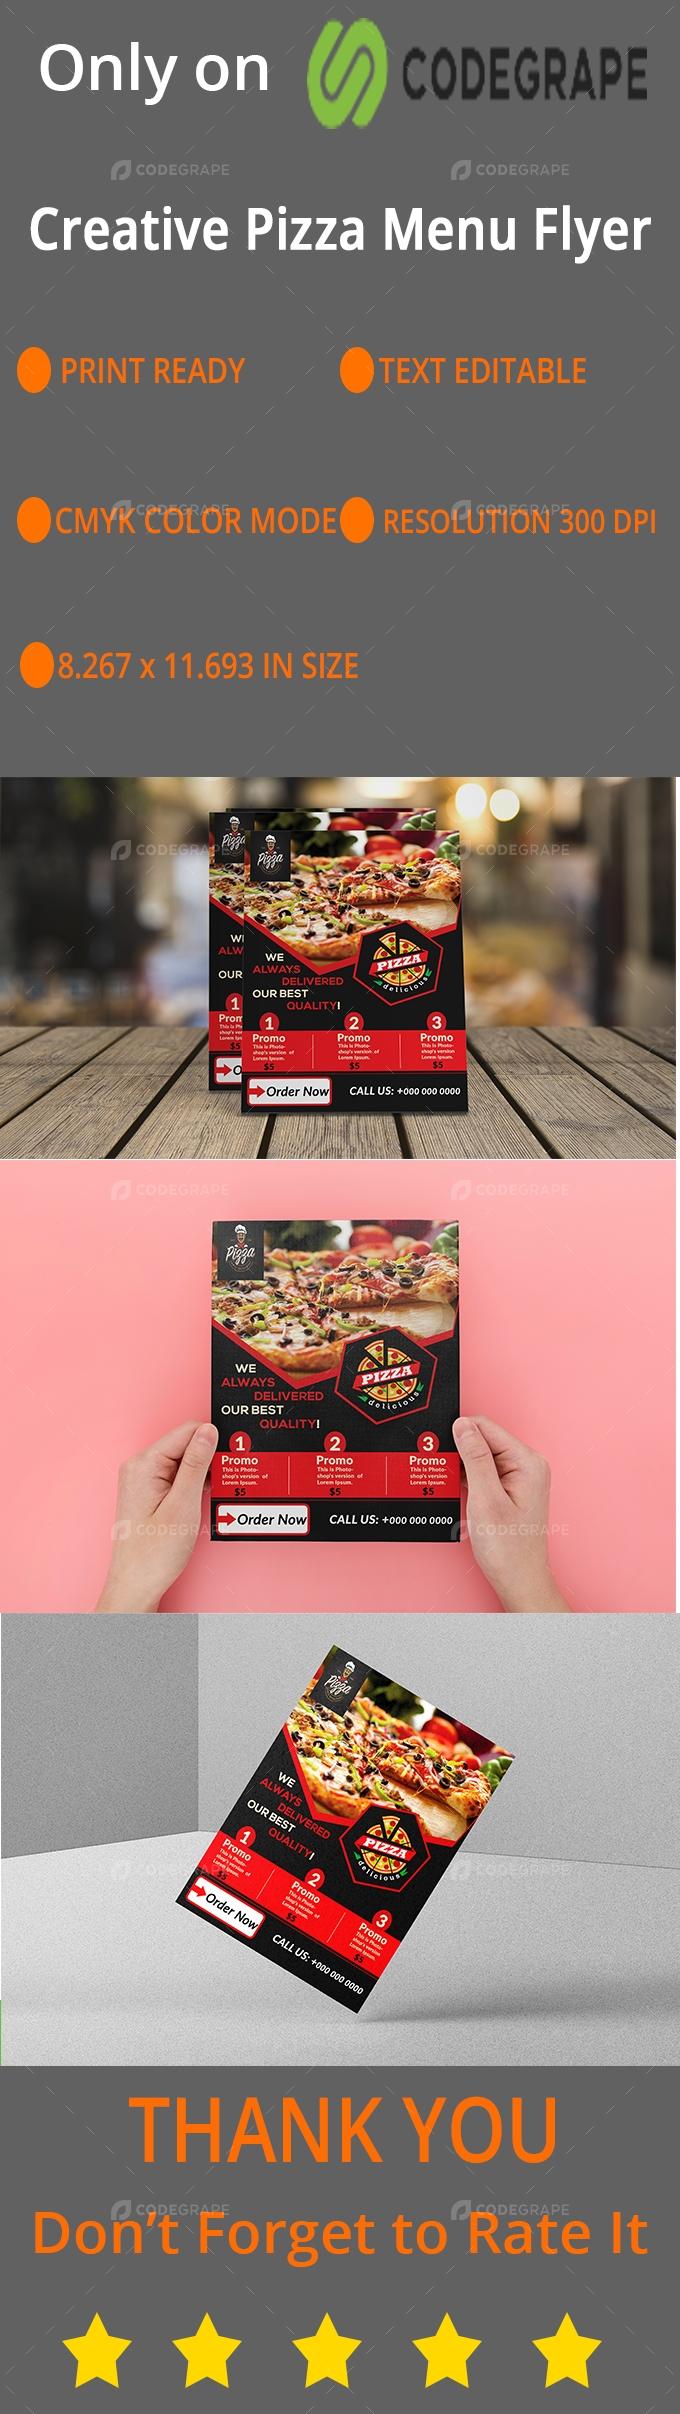 Creative Pizza Flyer Design